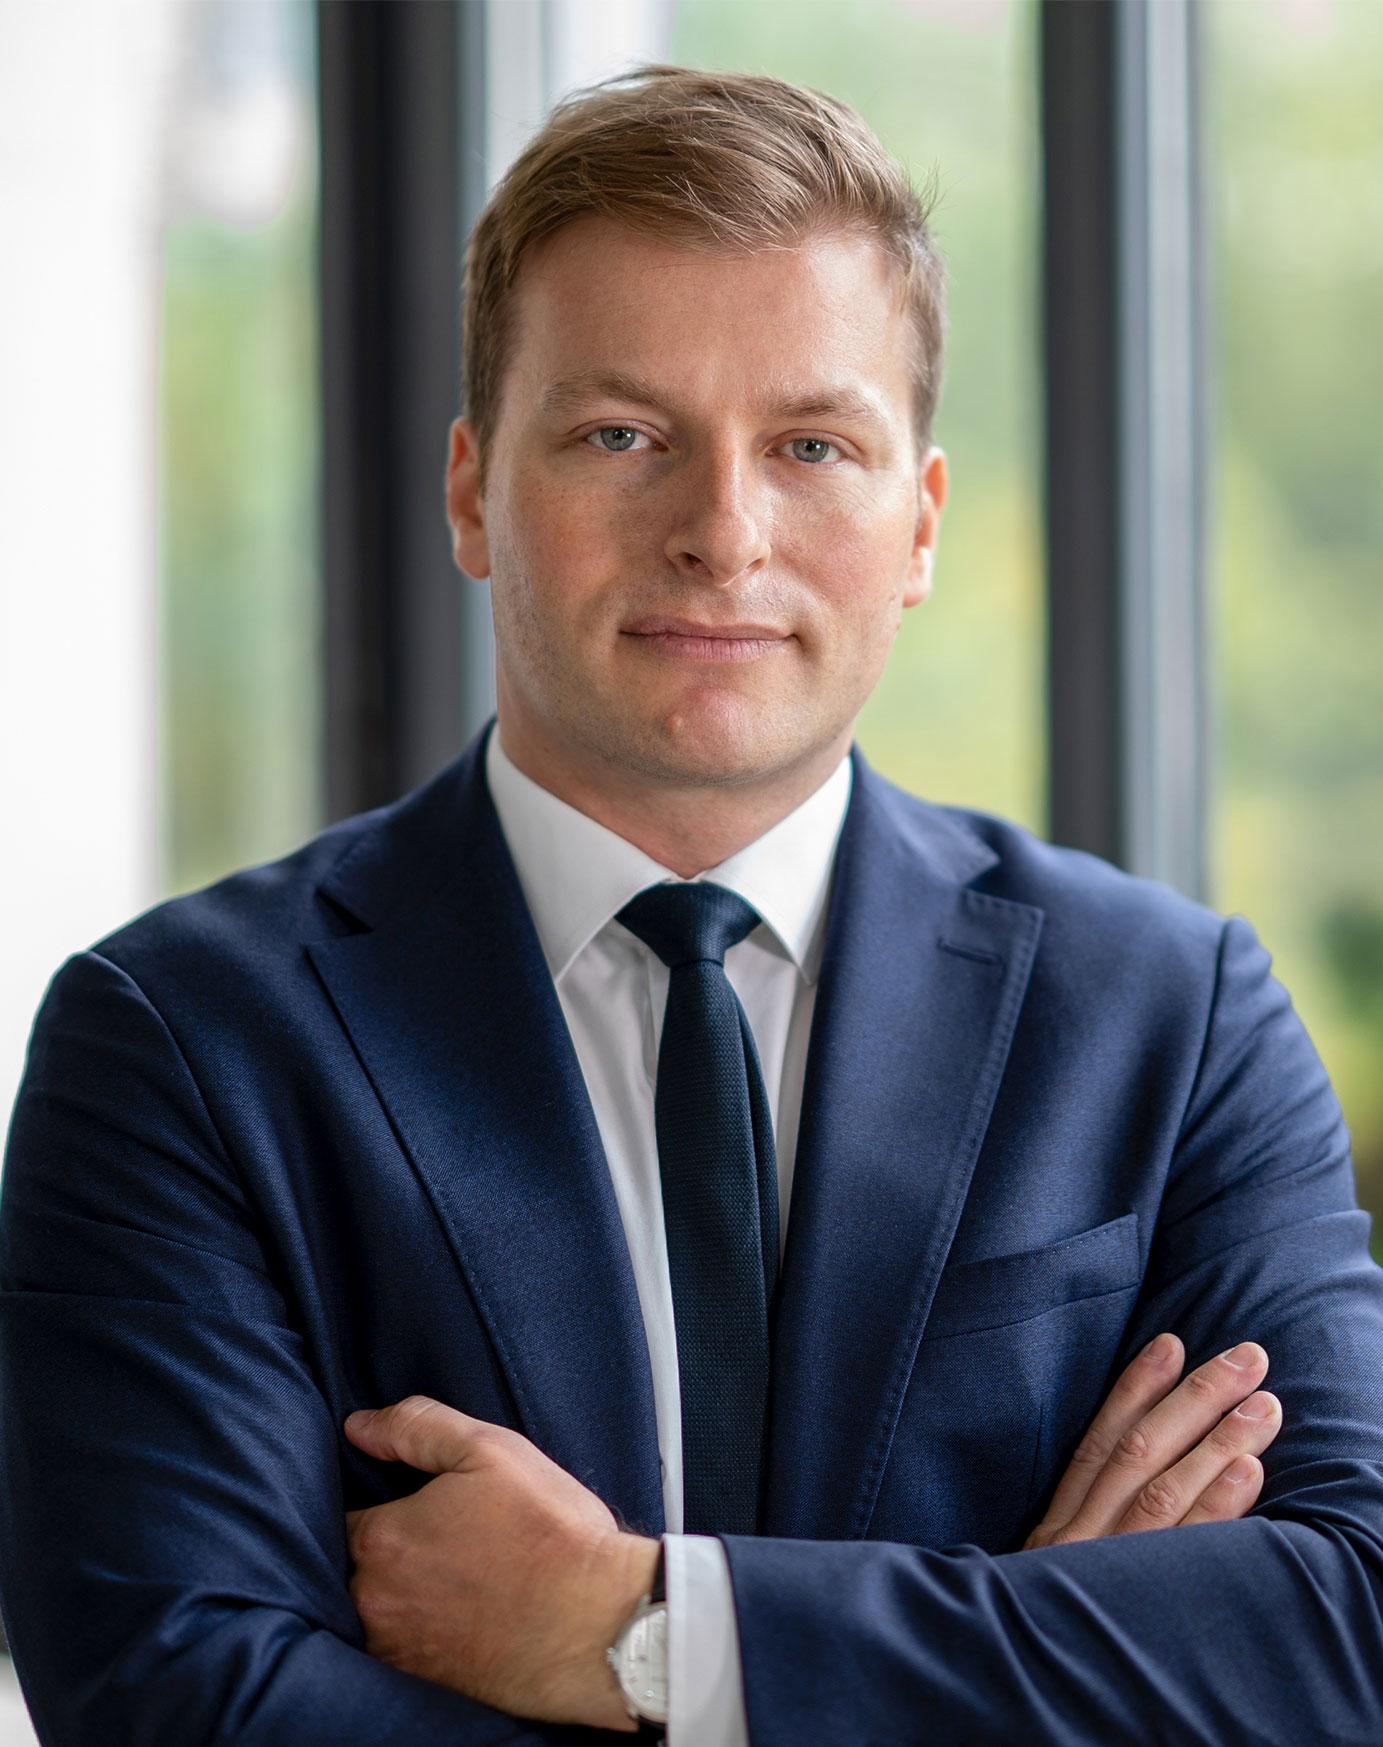 Christopher Brehm